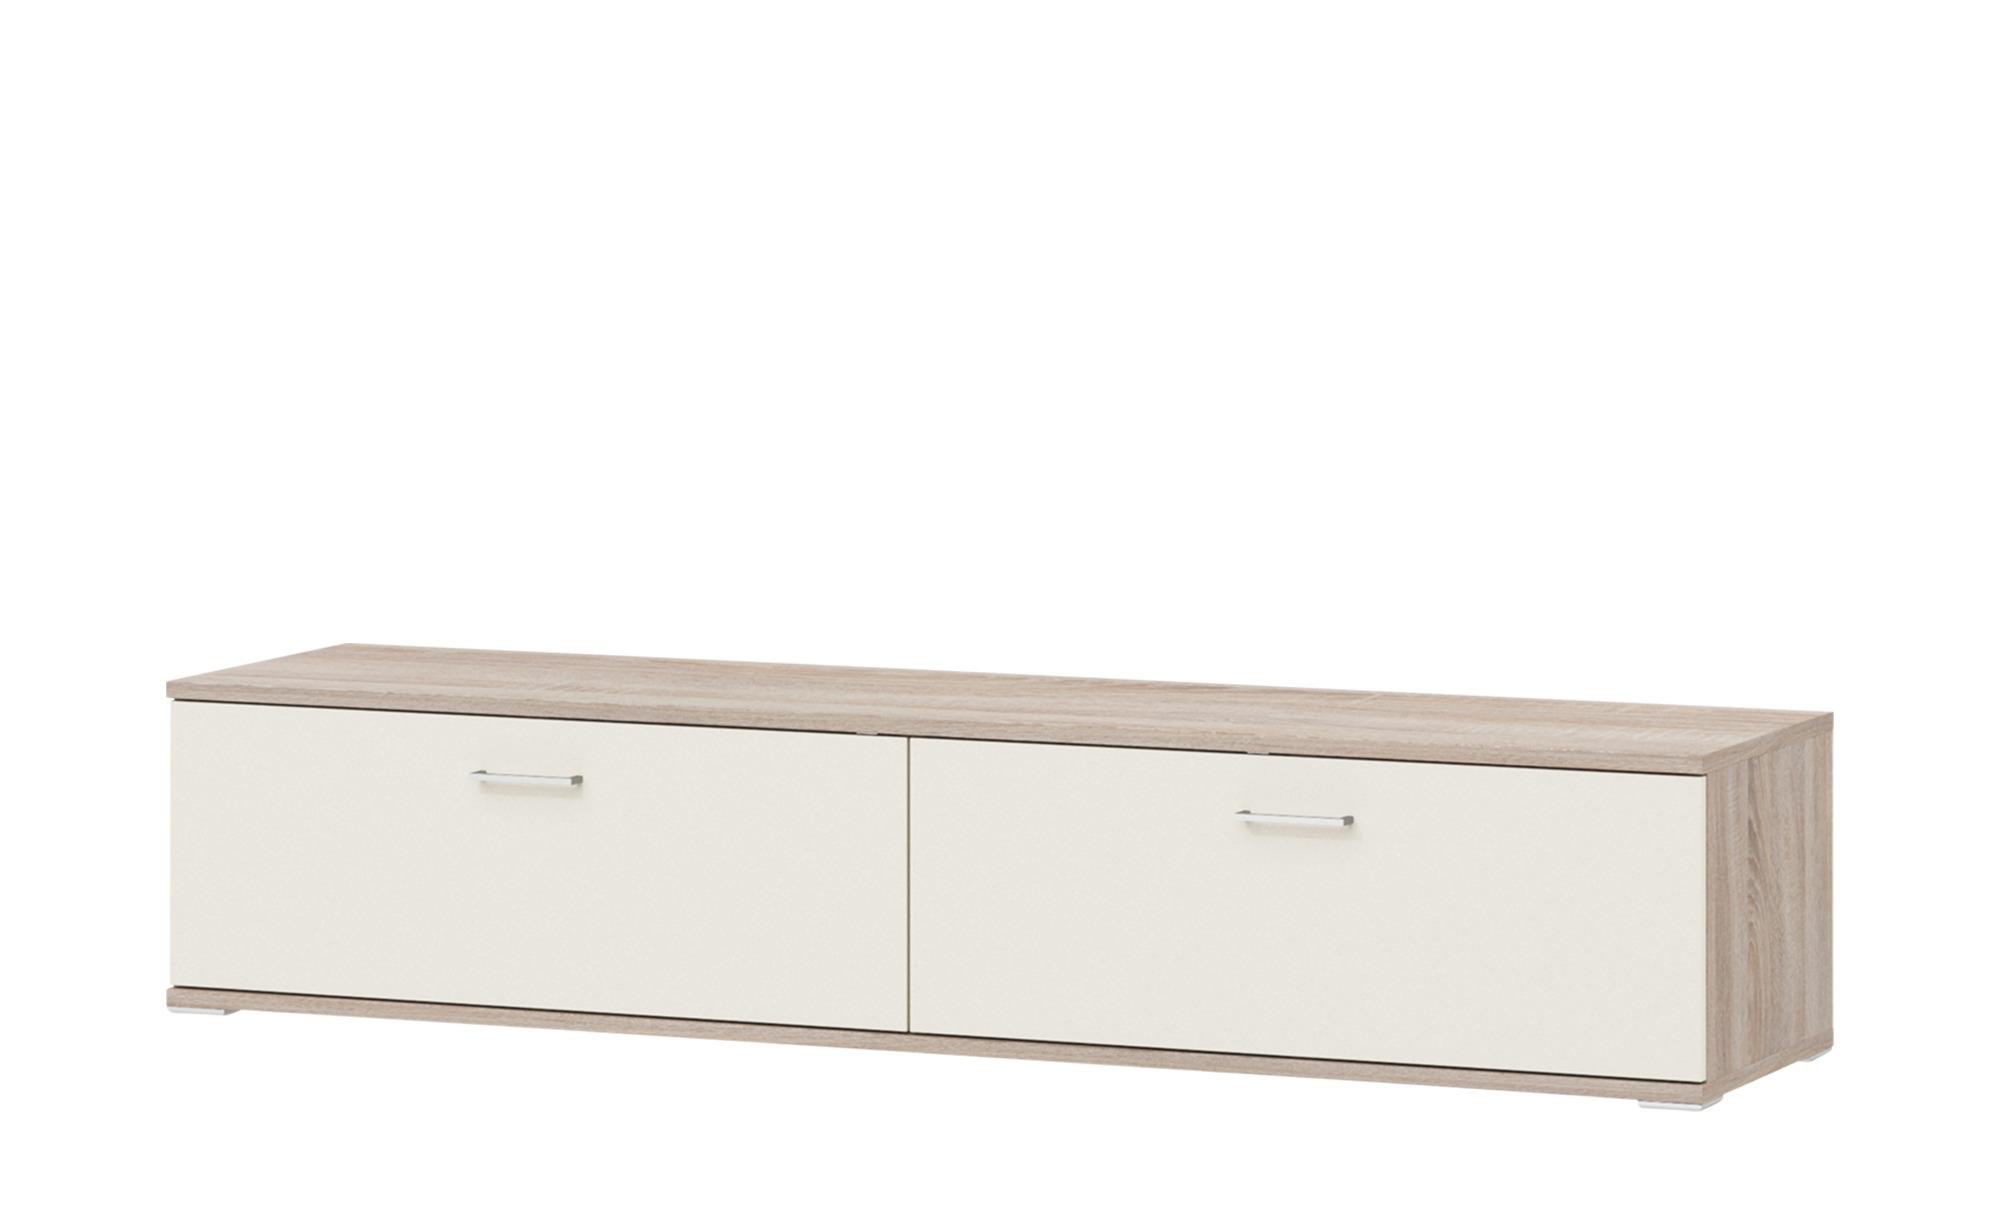 uno Lowboard  Onyx ¦ Maße (cm): B: 201 H: 42 T: 49 Kommoden & Sideboards > Lowboards - Höffner